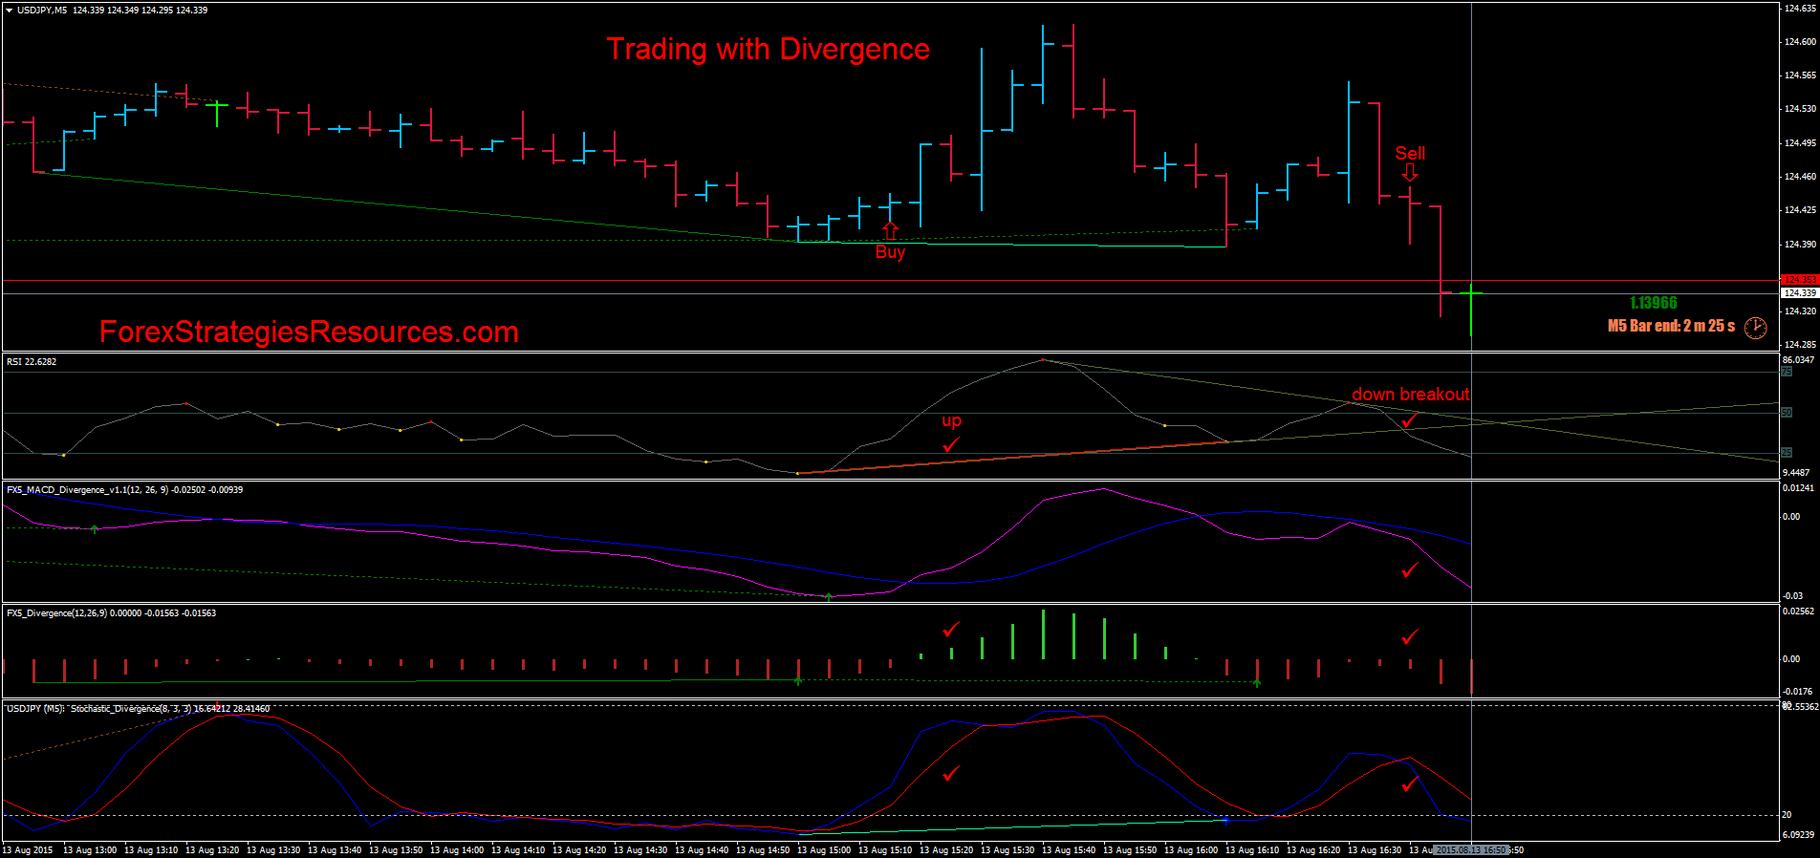 Best divergence trading system